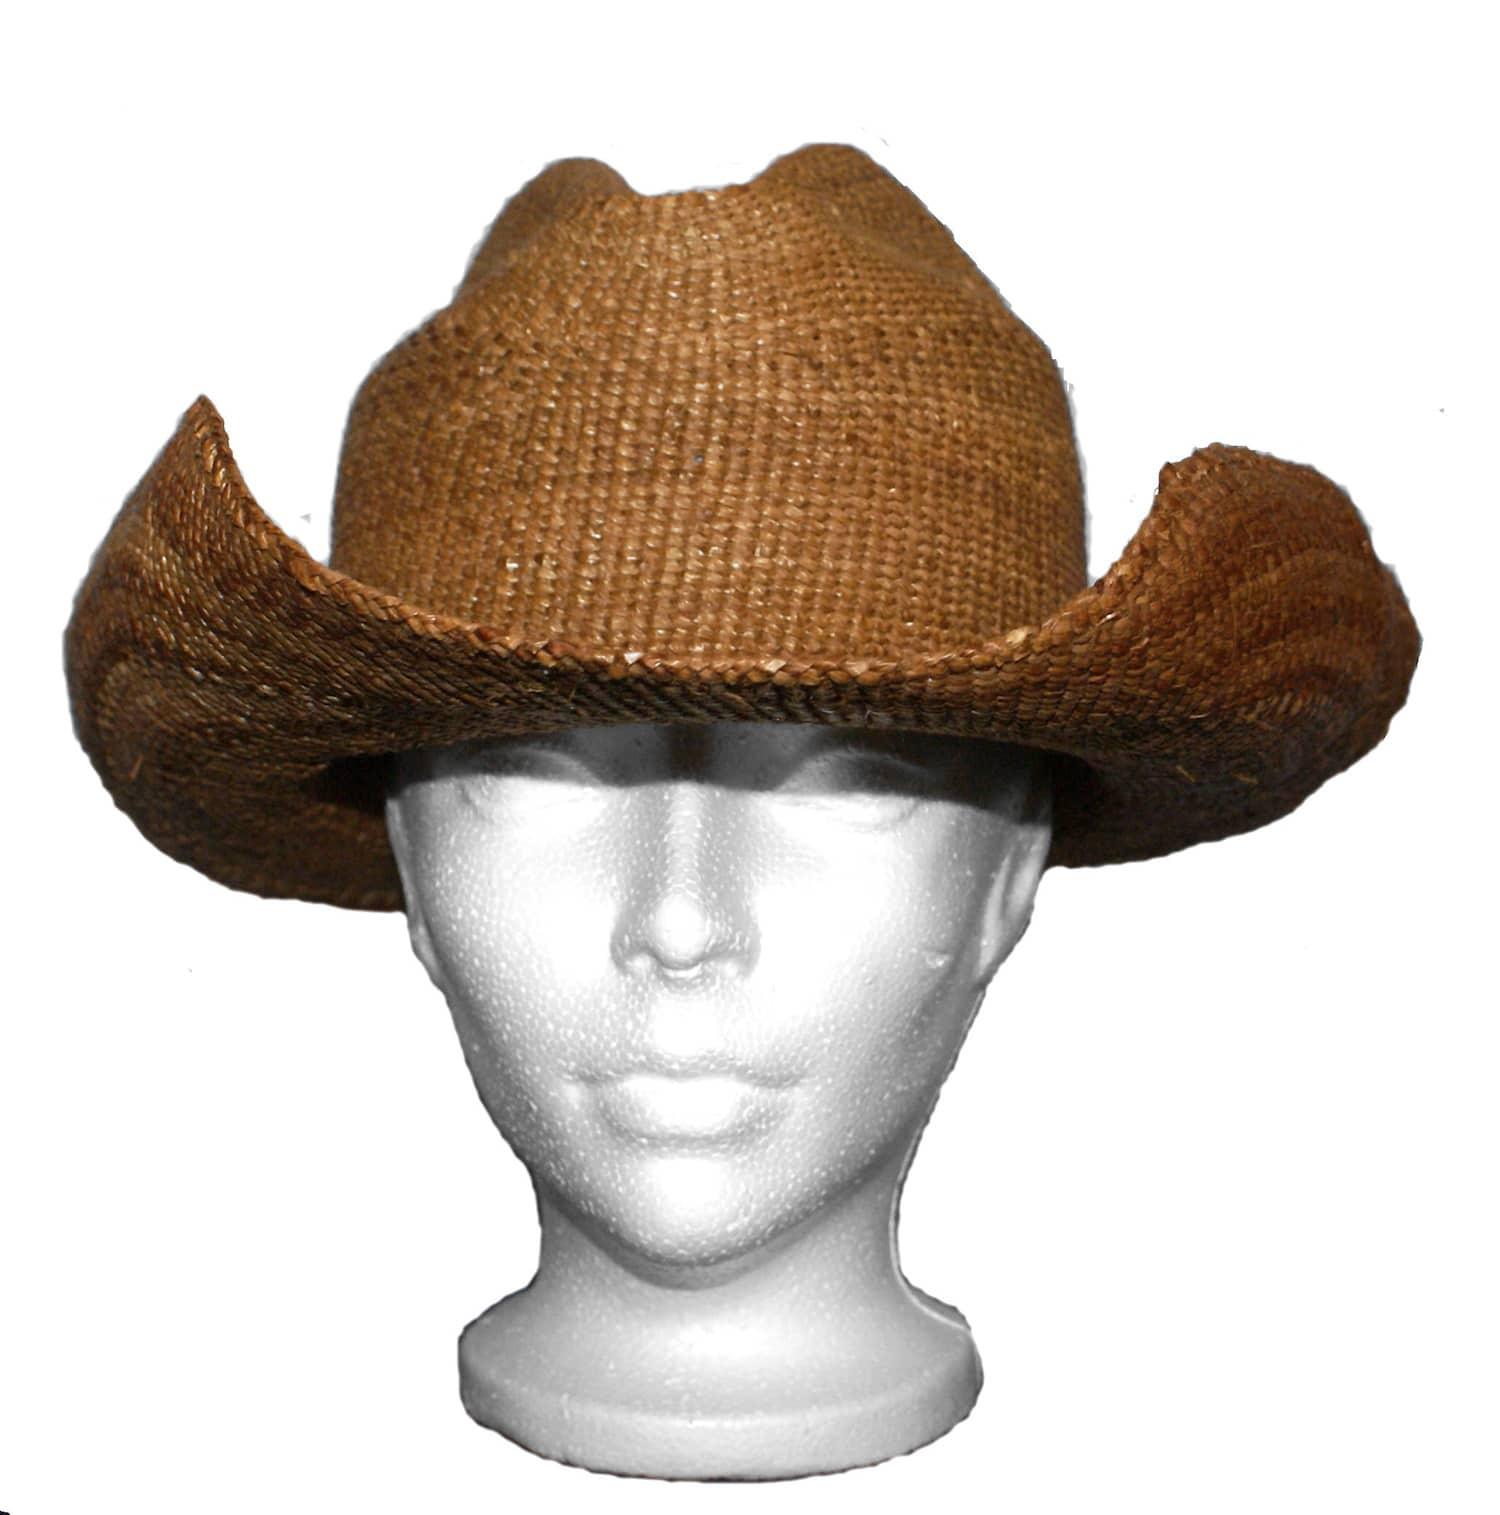 2013-FNA-margaret-liddle-RedCedarTwinedTexan_Cowboy_Hat_2010